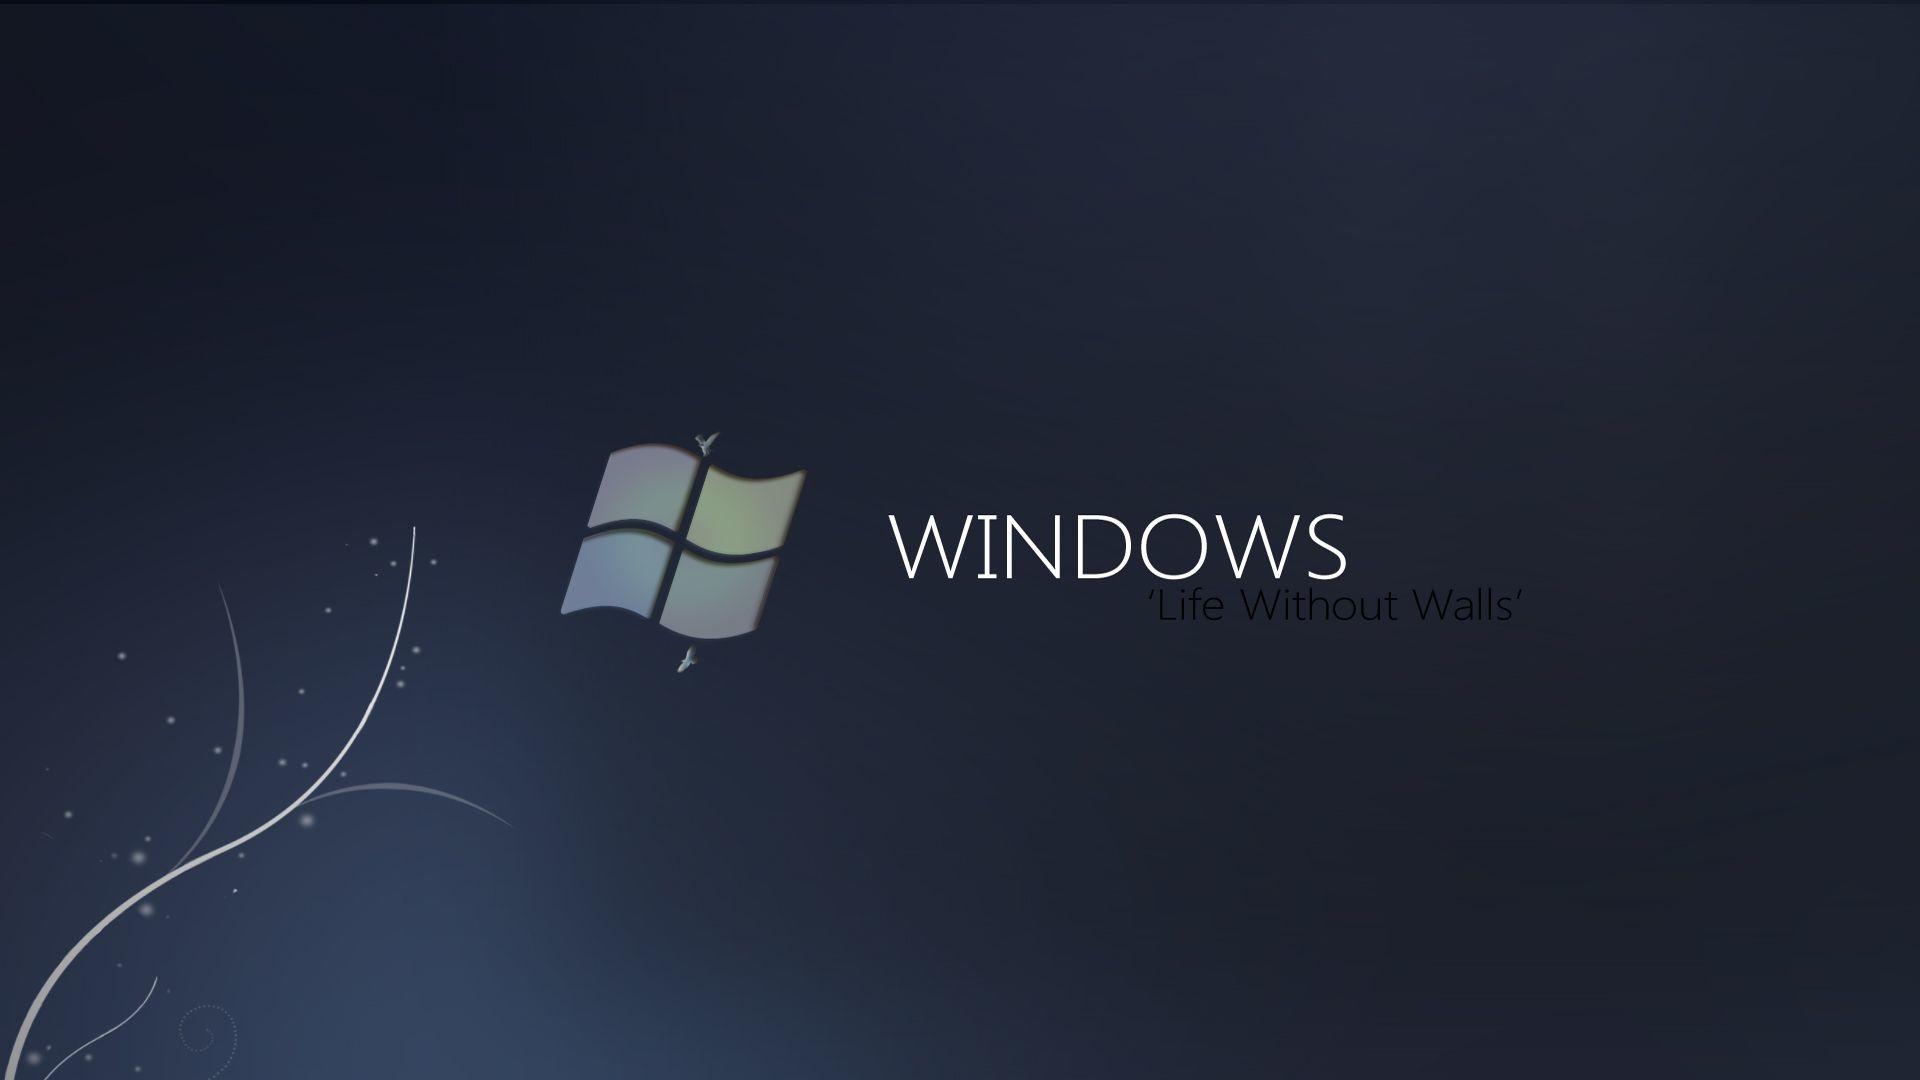 Res: 1920x1080, Windows Server Wallpaper | HD Wallpapers by Mark | Pinterest | Wallpaper